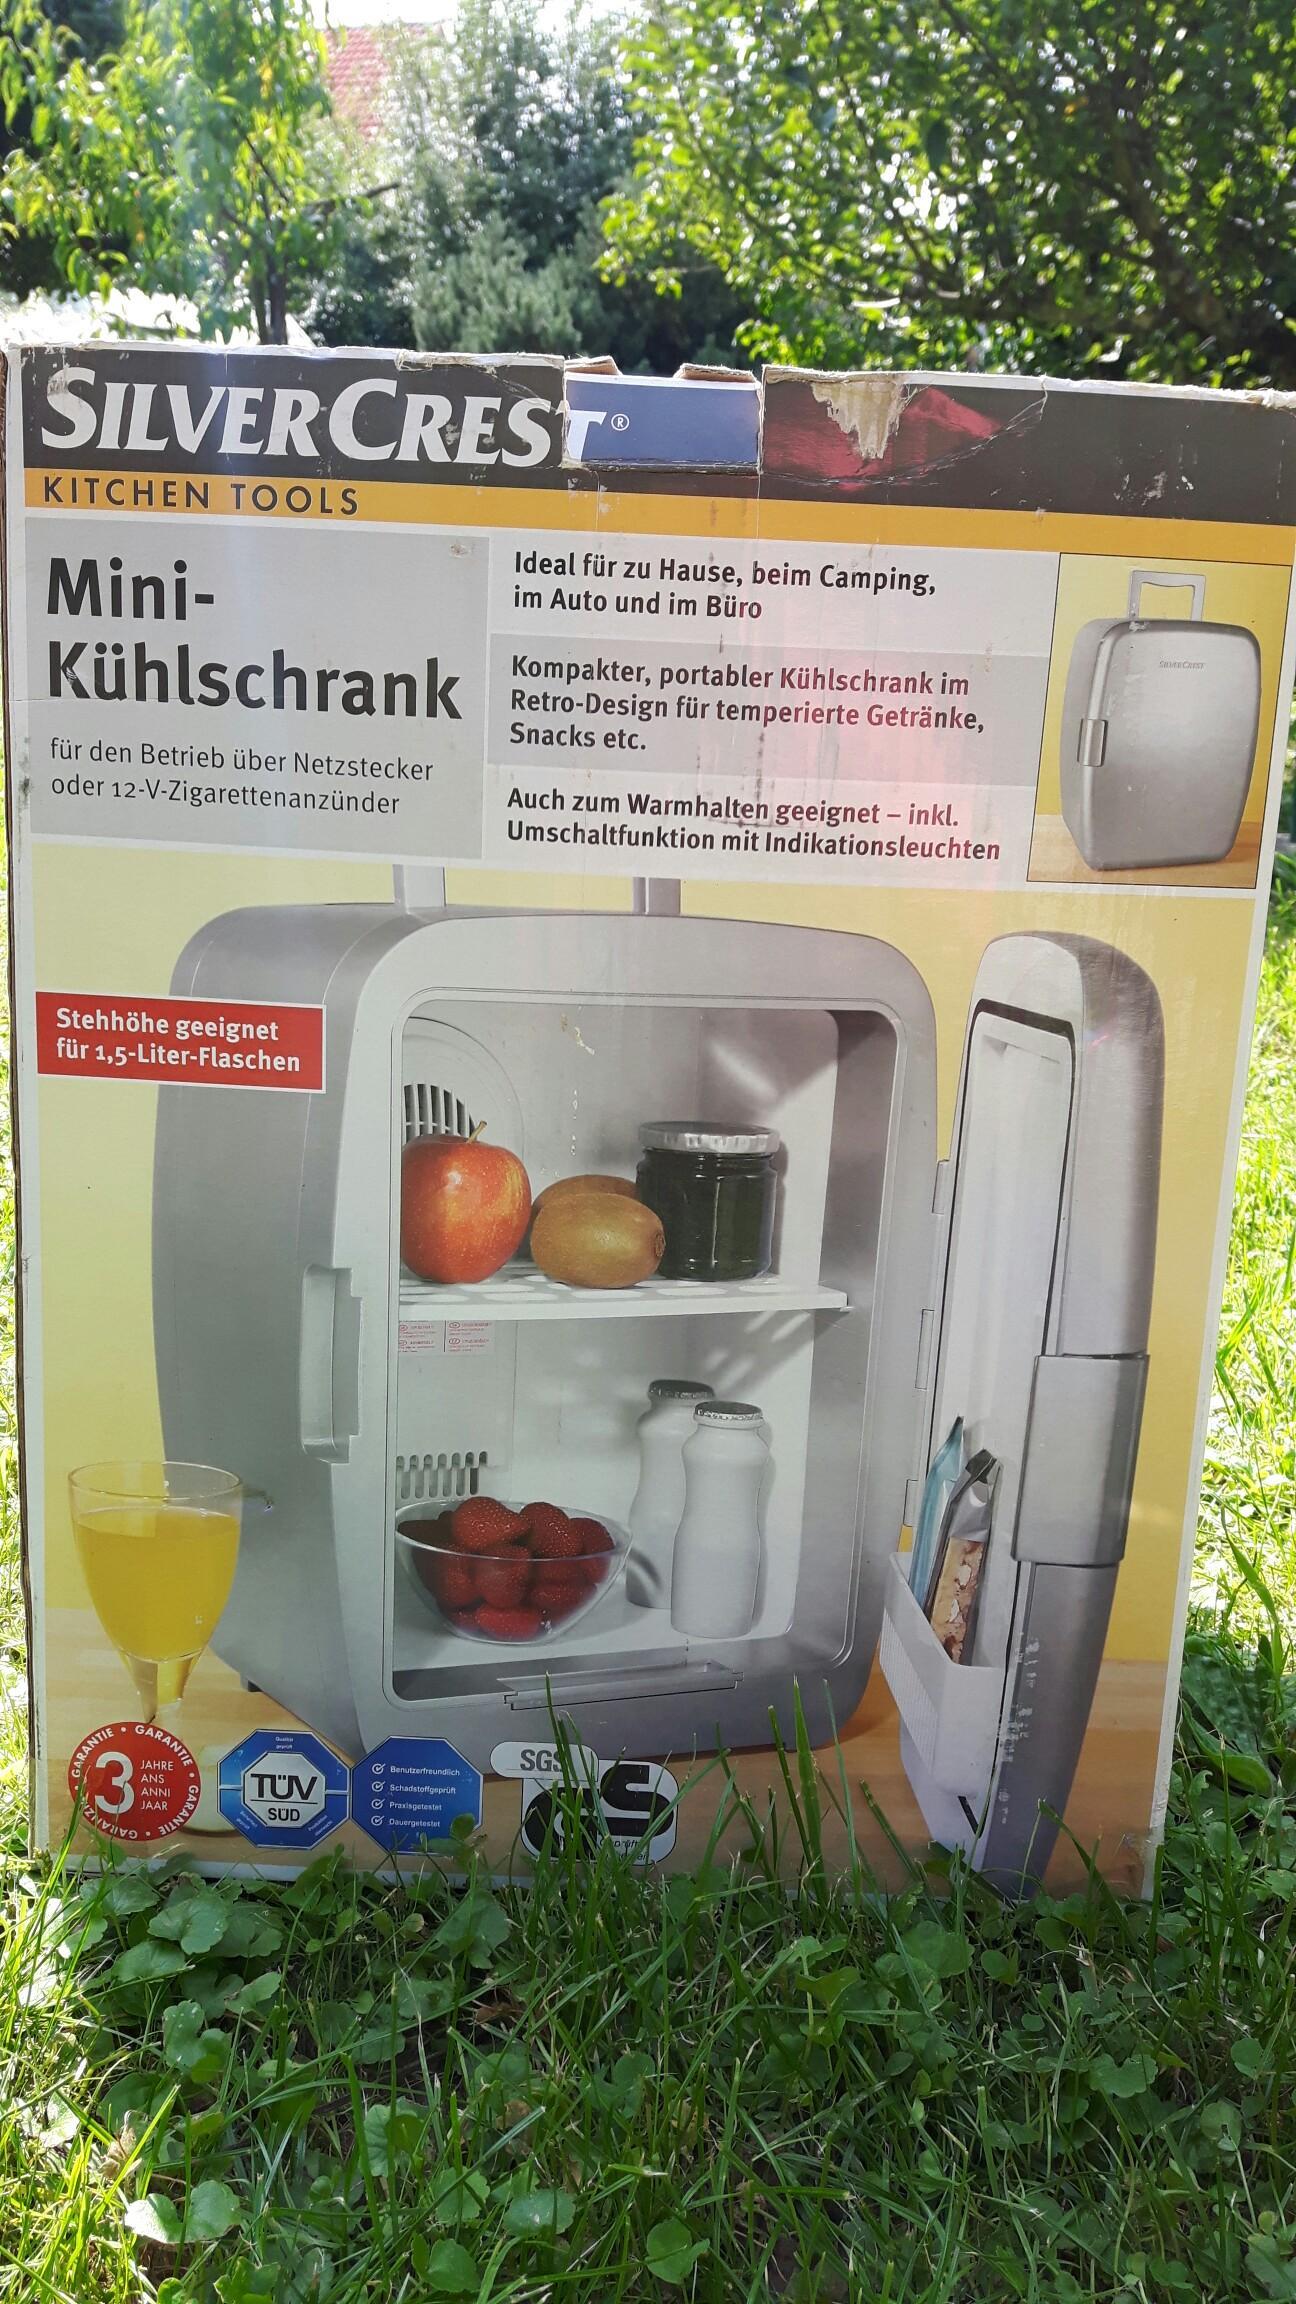 Silvercrest Mini Kühlschrank : Gebraucht mini kühlschrank in eppingen um u ac u shpock